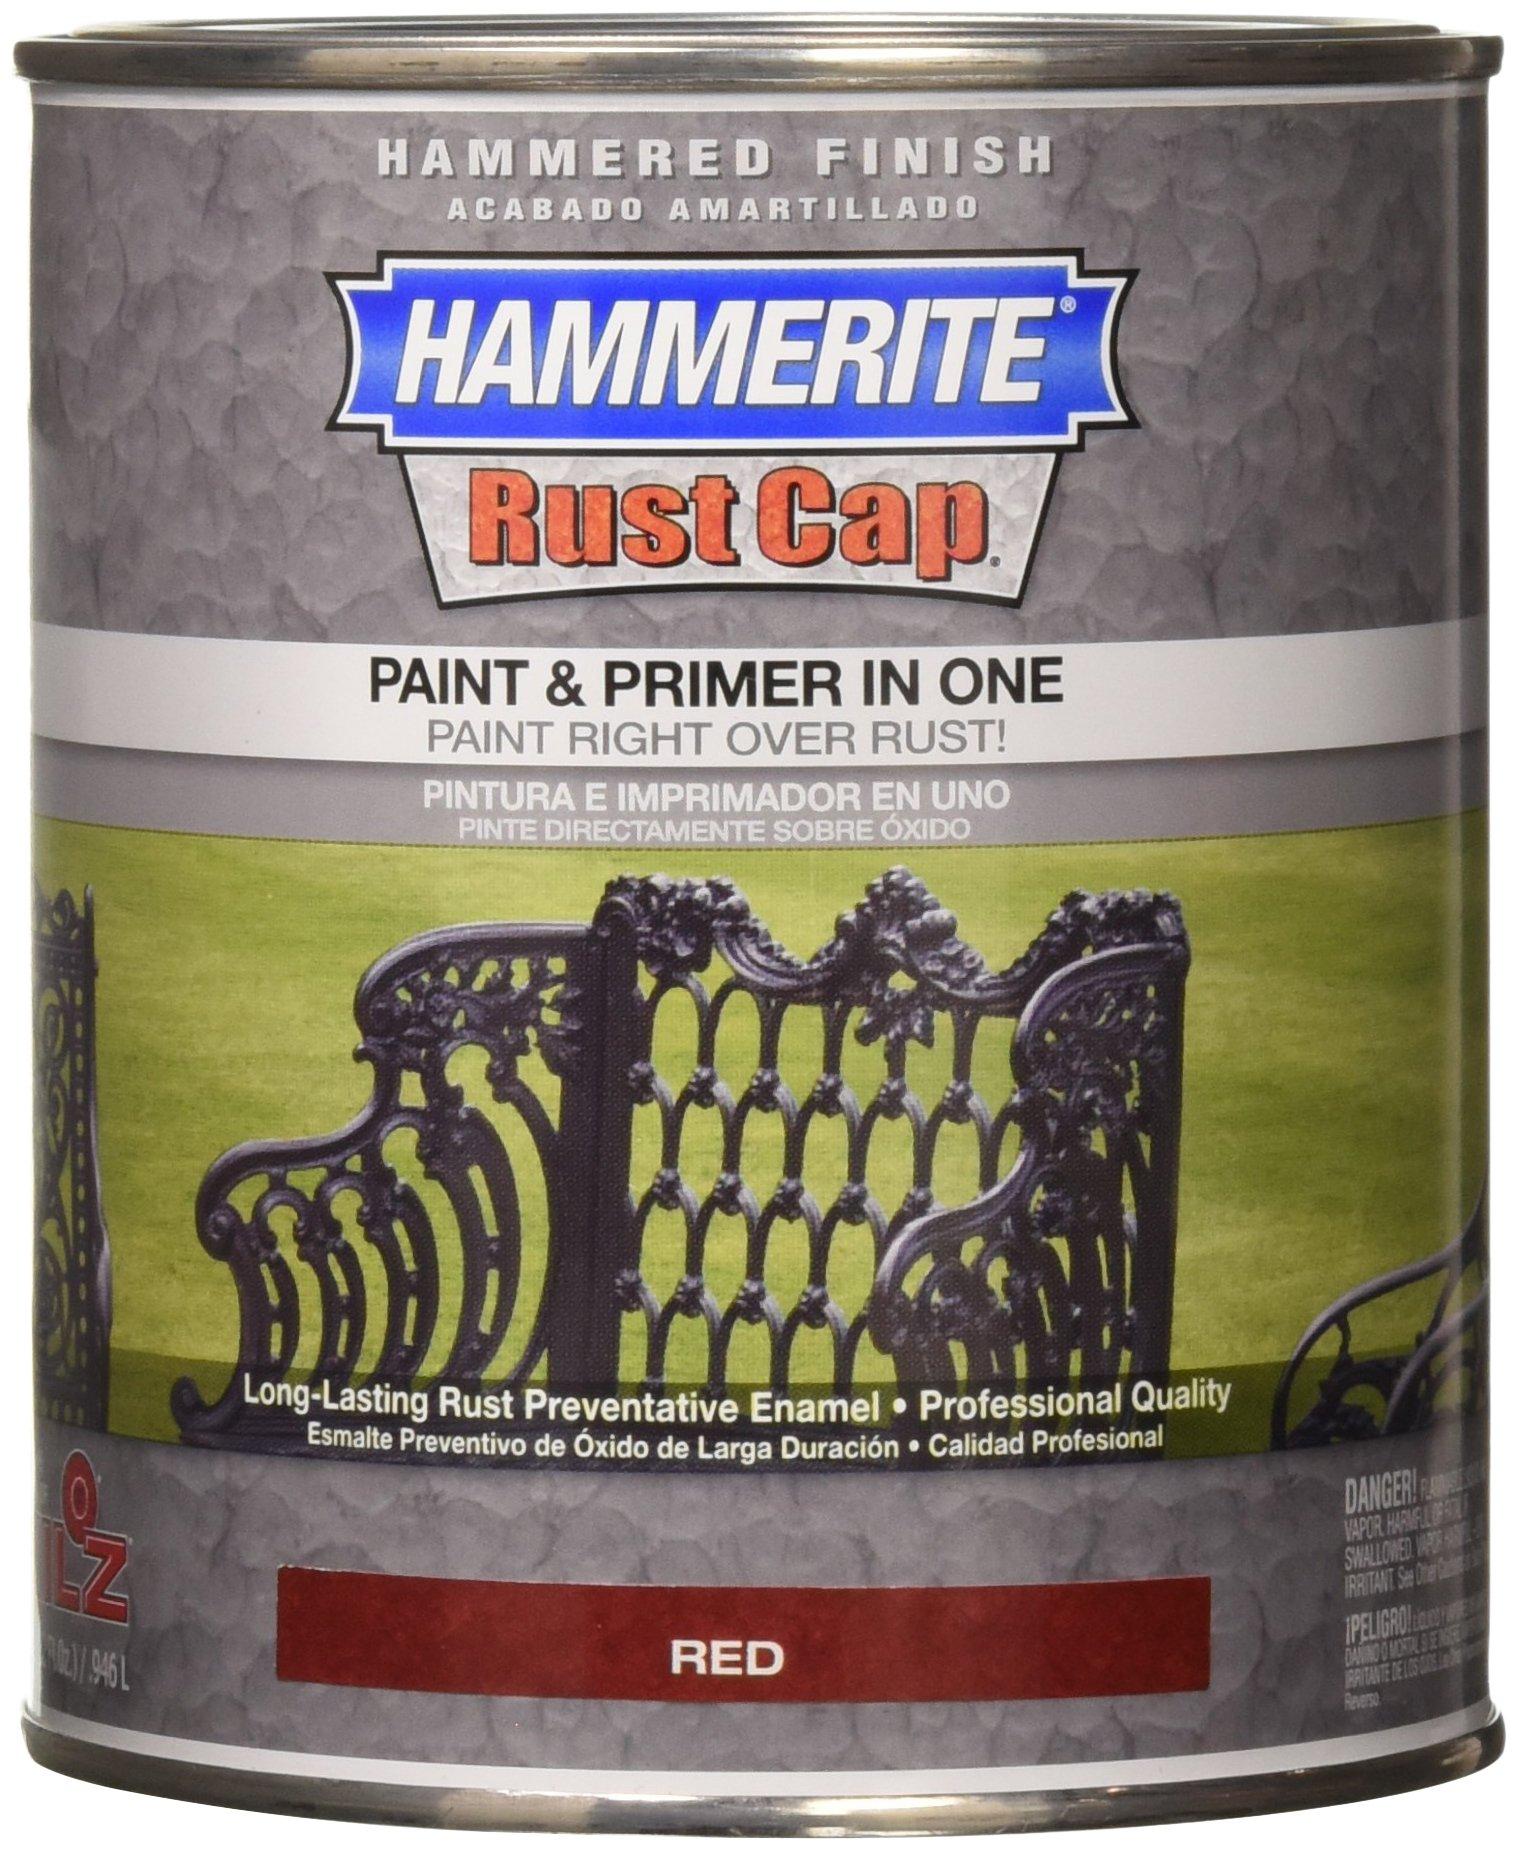 Masterchem 43180 Hammerite Metal Hammered Finish